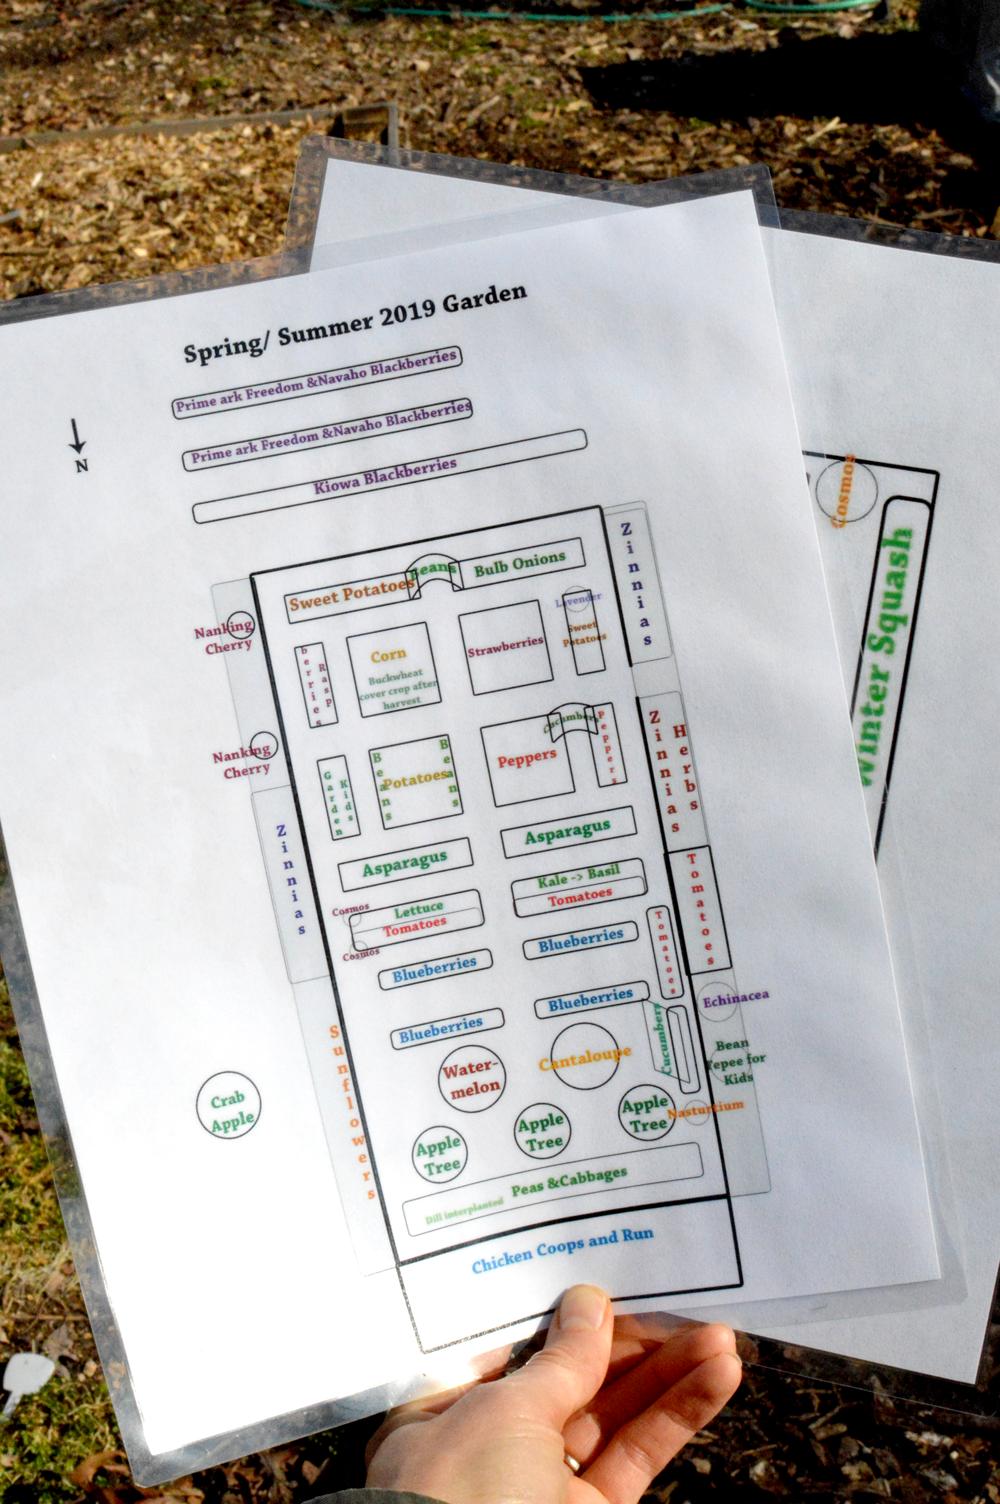 My Laminated Garden Guides